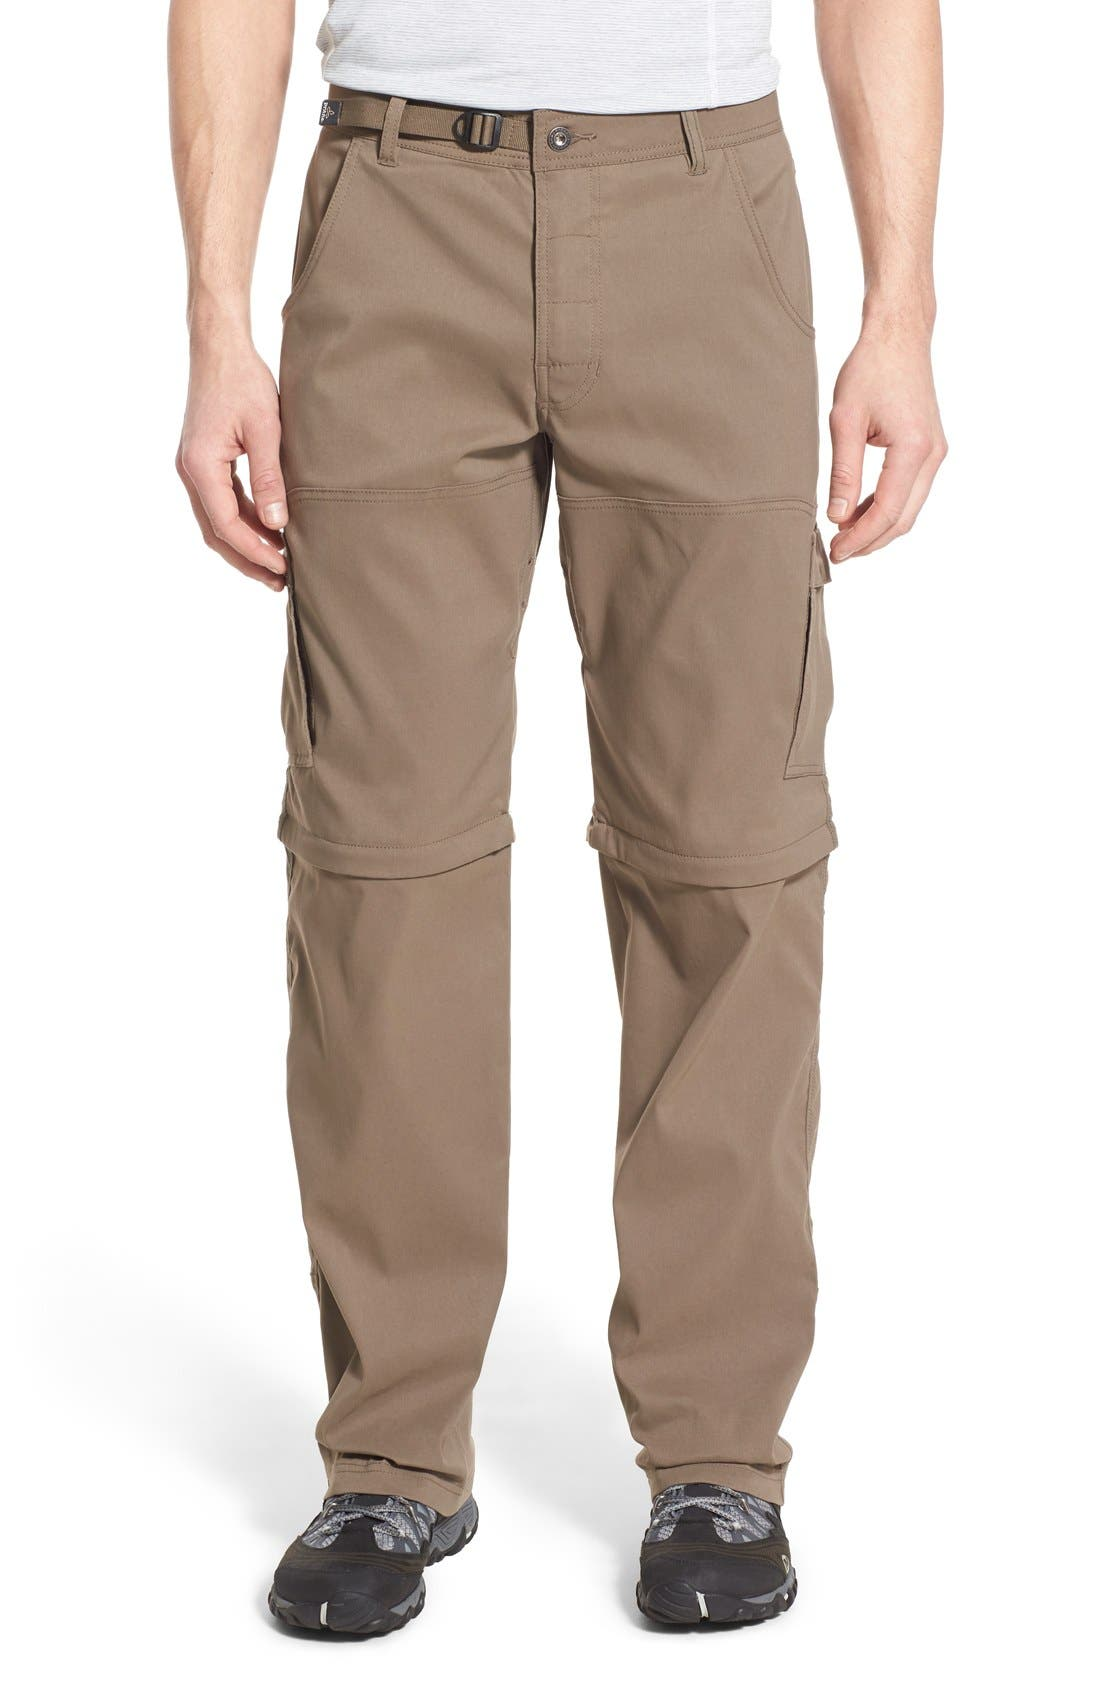 prAna Zion Stretch Convertible Cargo Hiking Pants